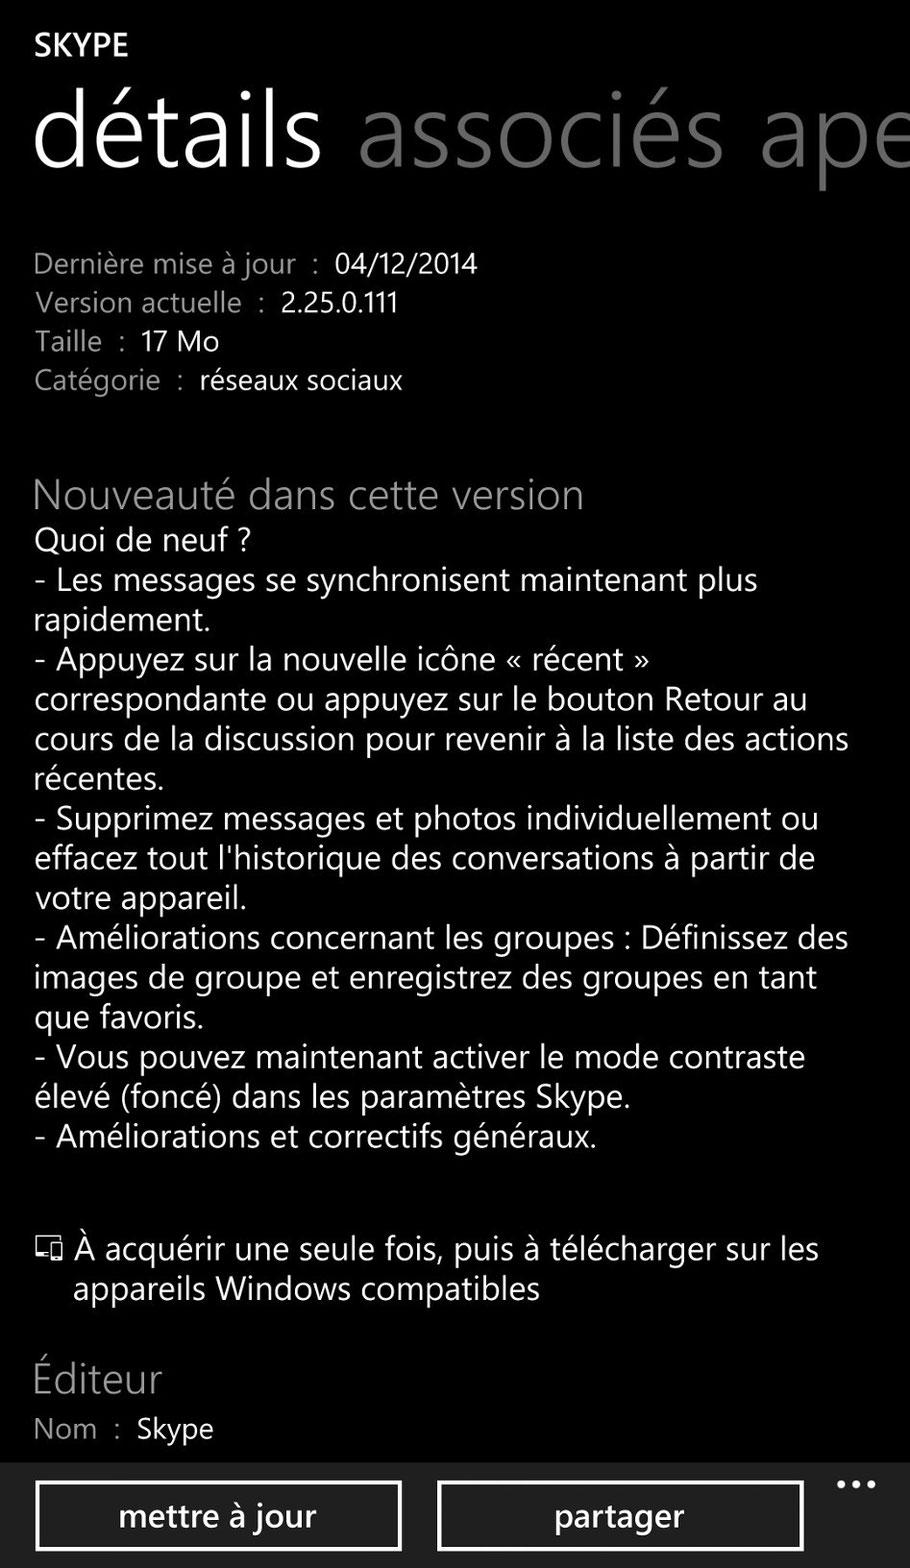 Skype MAJ du 04/12/2014 sur Windows Phone.